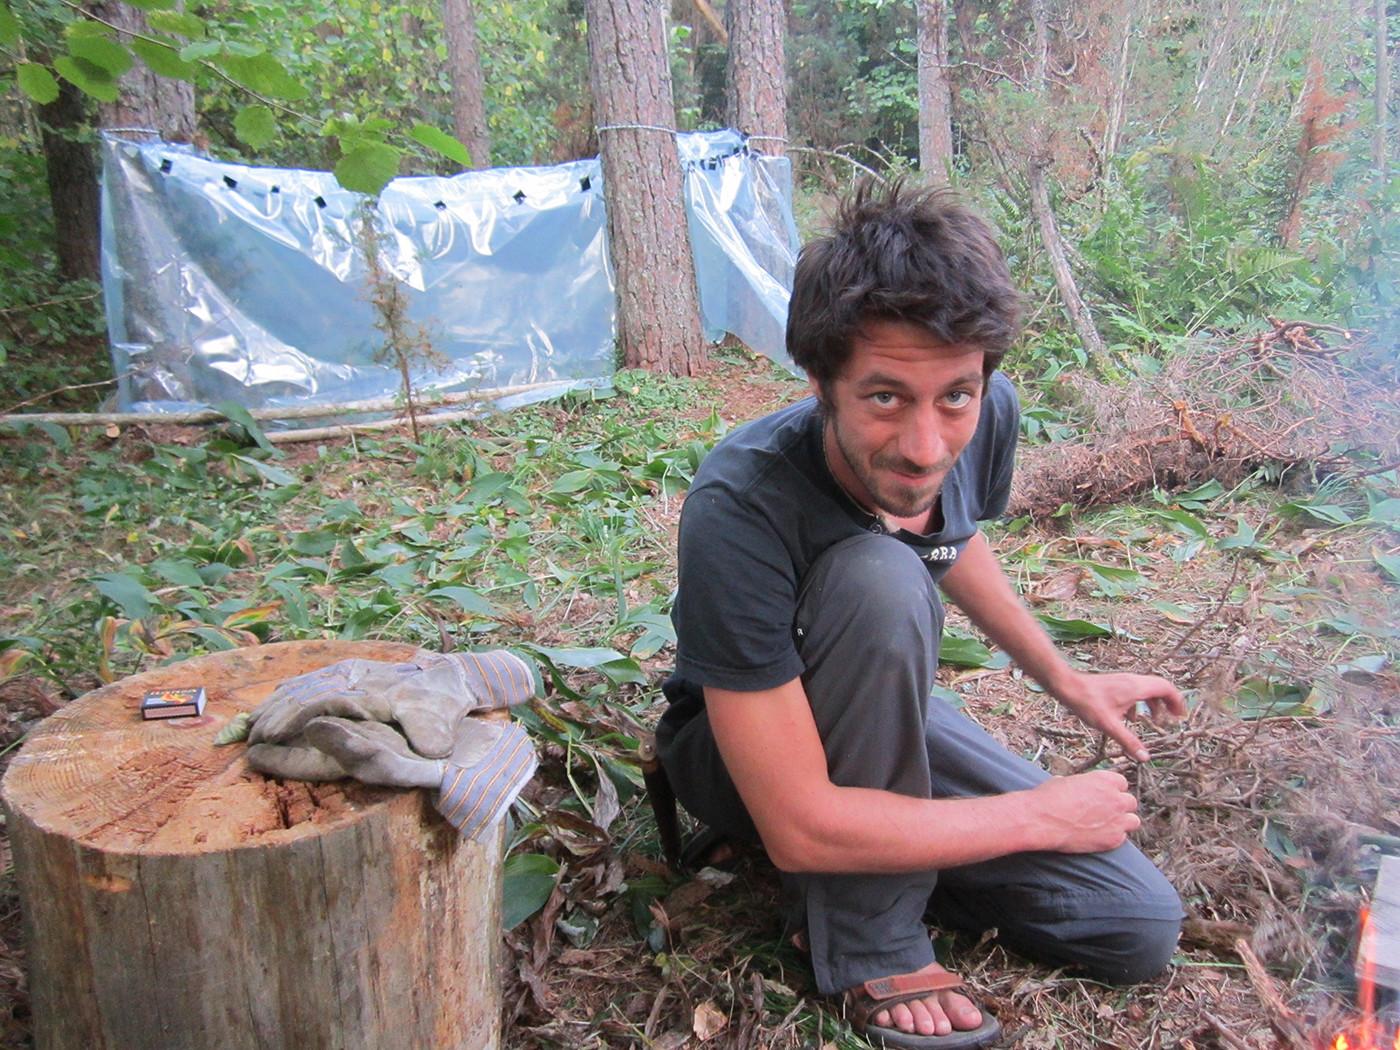 Adam Cullen in Noarootsi. The structure in the background is an Estonian plastic sauna.